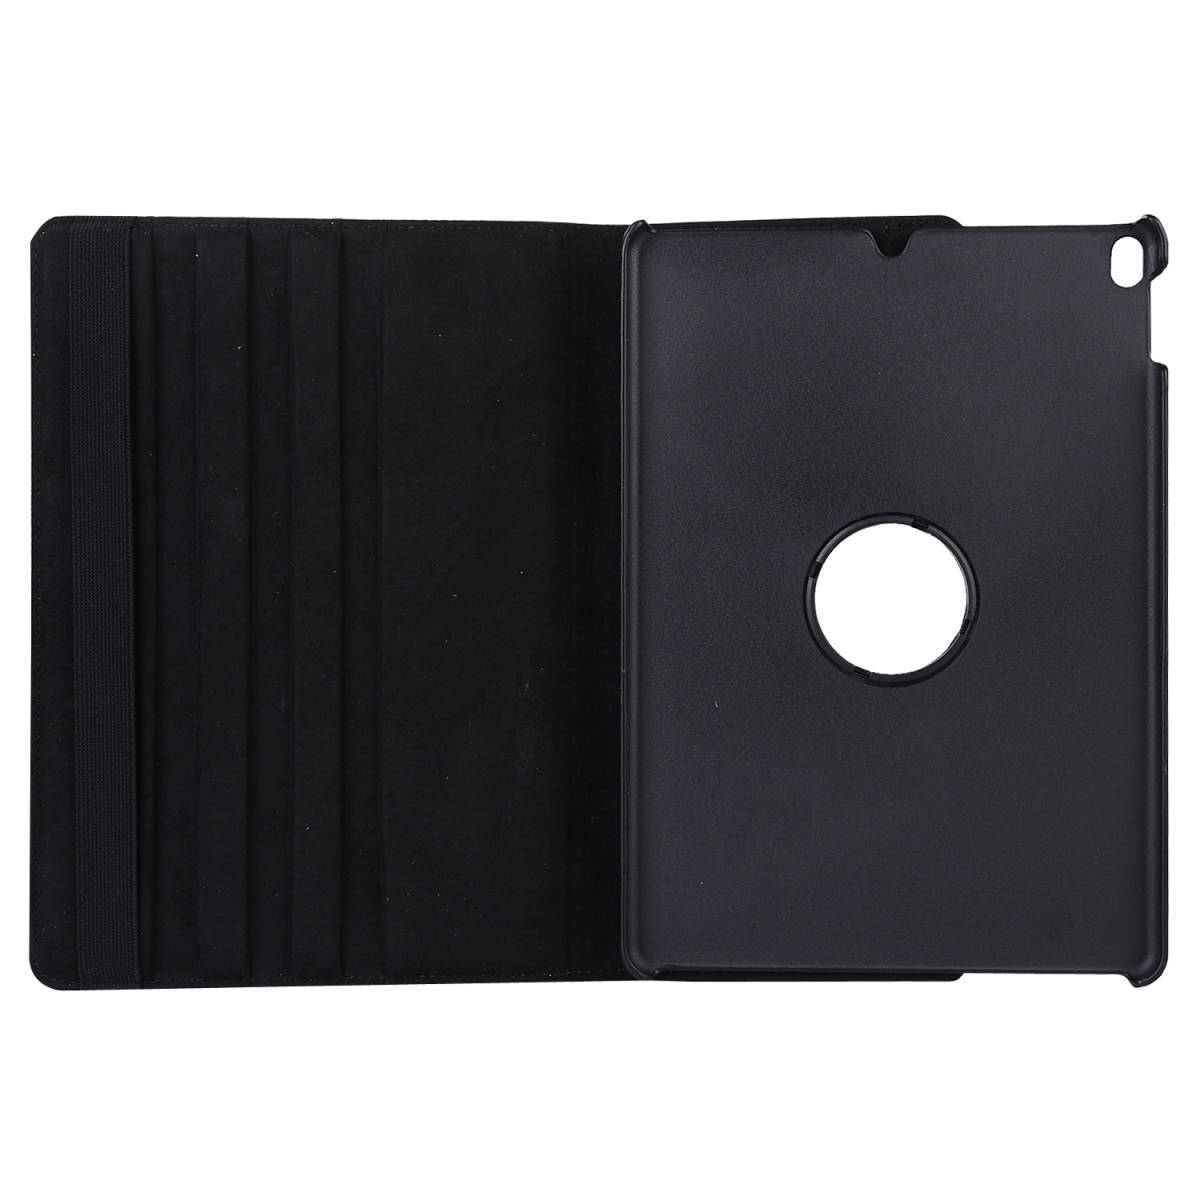 iPad Air 2019年型 10.5インチ ケース (黒) iPad Pro 2017年型 合革レザー 360回転 スタンドケース 耐衝撃 多角度 アイパッド保護カバー_画像4